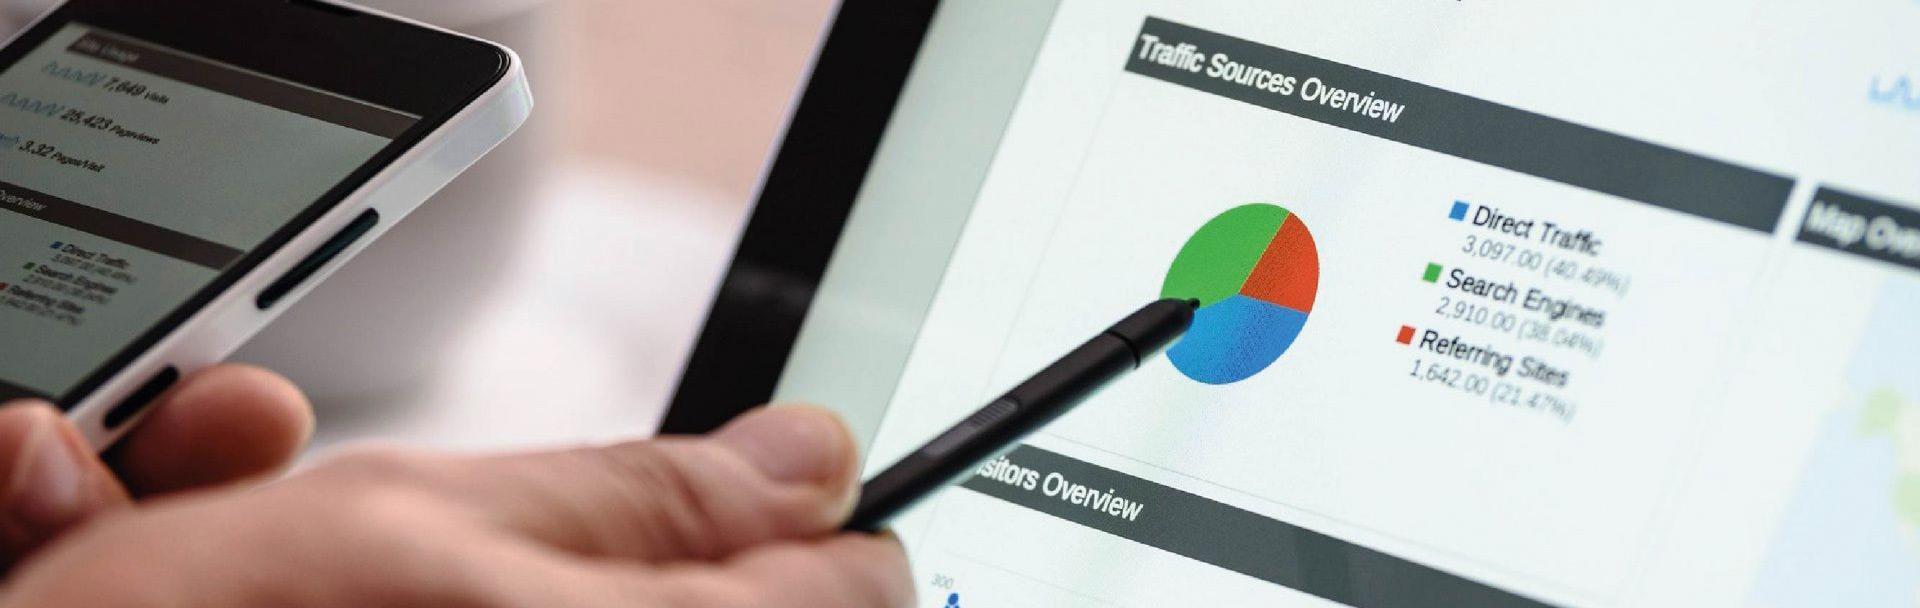 Cloud platform for promoter's management in Falabella stores